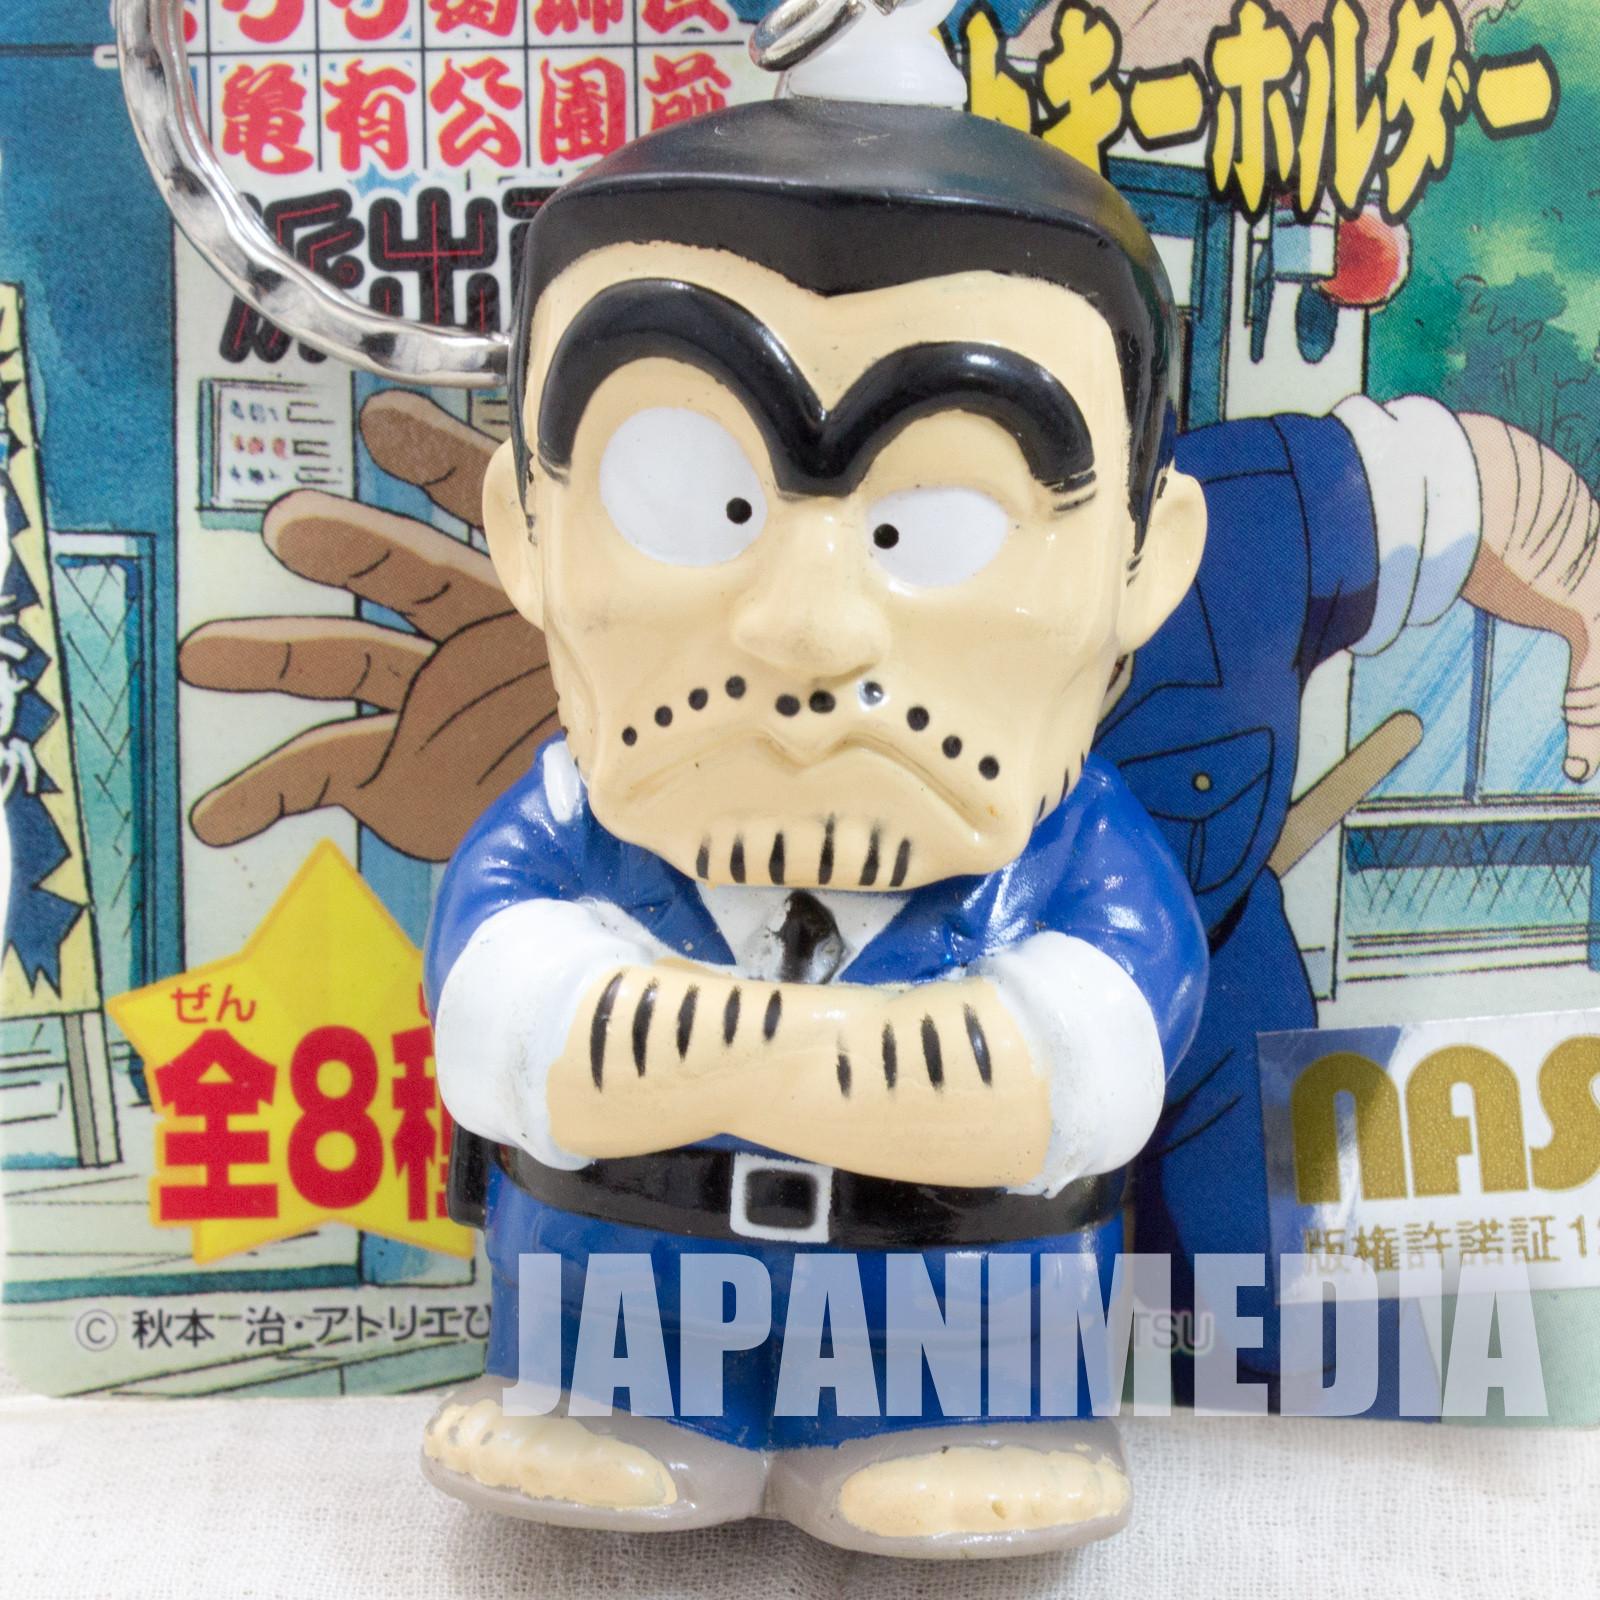 KochiKame Kankichi Ryotsu #2 Soft Vinyl Figure Keychain JAPAN ANIME